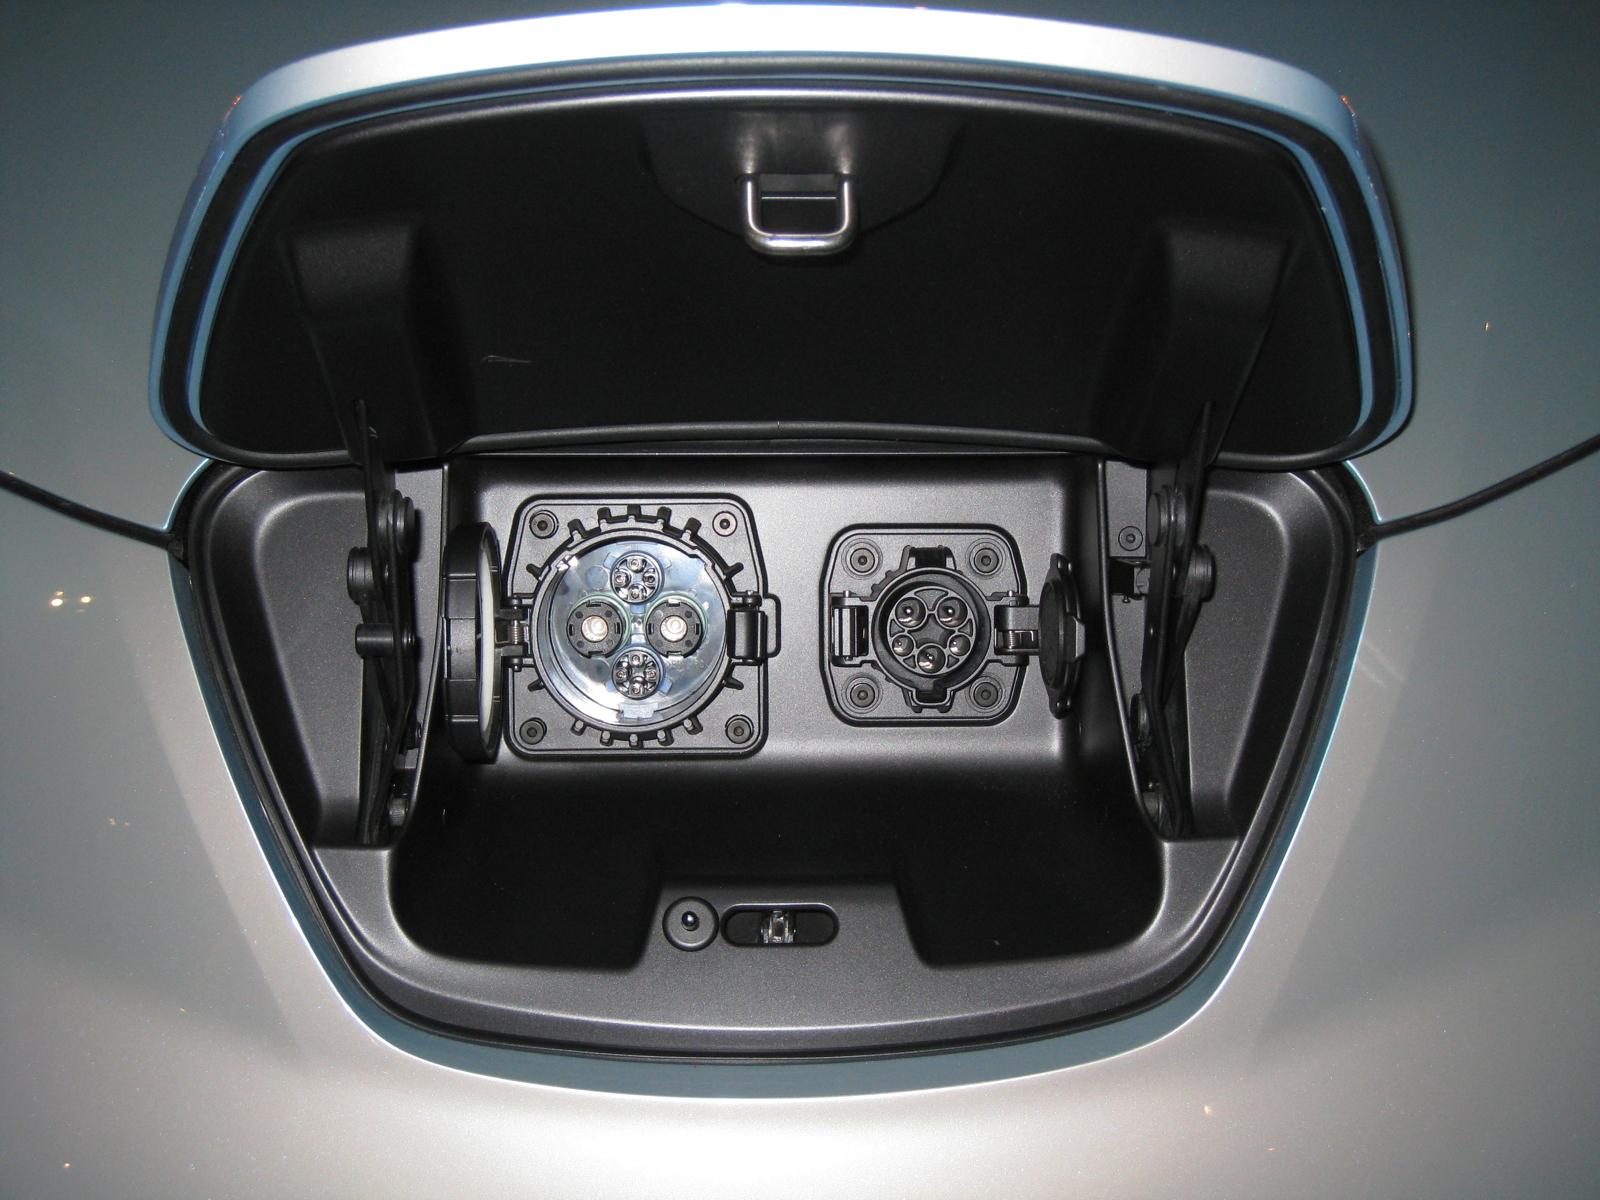 Casteyanqui Com Electric Vehicles Quick Charge